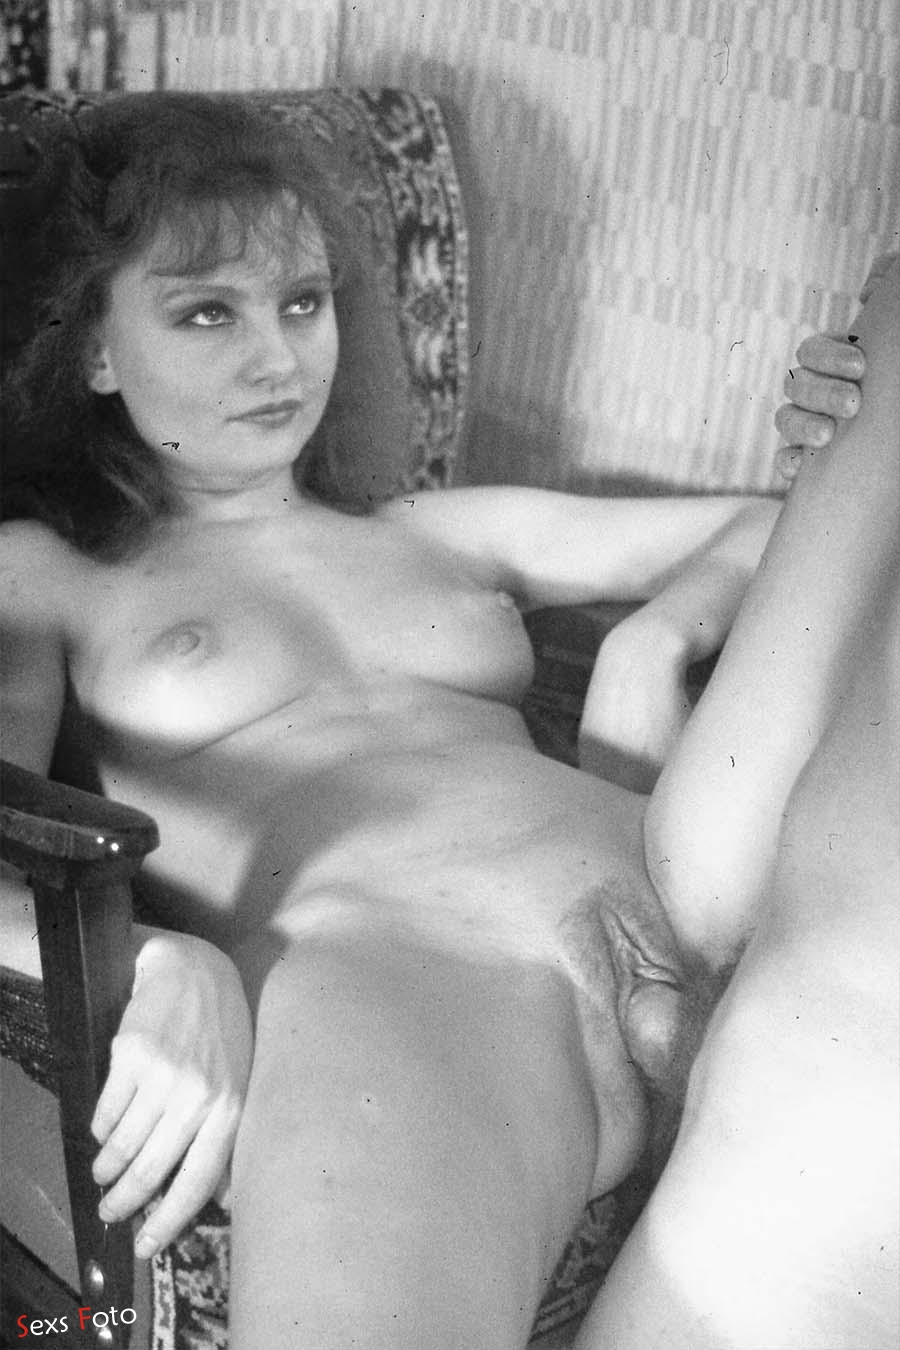 Ретро порно фото секс с окончанием в волосатую киску